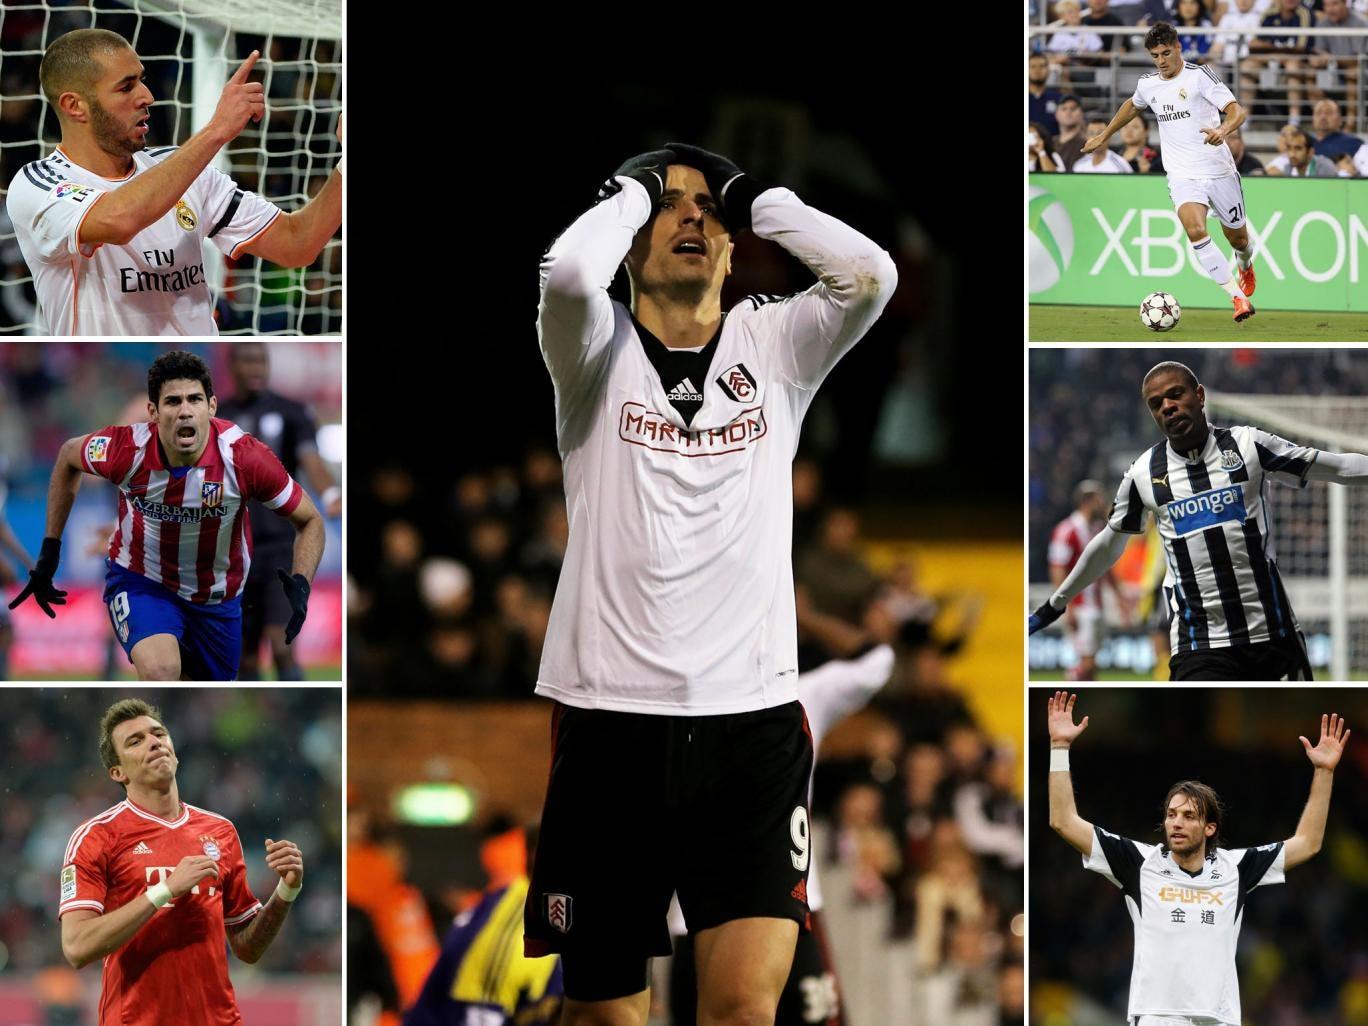 Arsenal could look to sign one of the above strikers (Clockwise from top-left) Karim Benzema, Dimitar Berbatov, Alvaro Morata, Loic Remy, Michu, Mario Mandzukic, Diego Costa